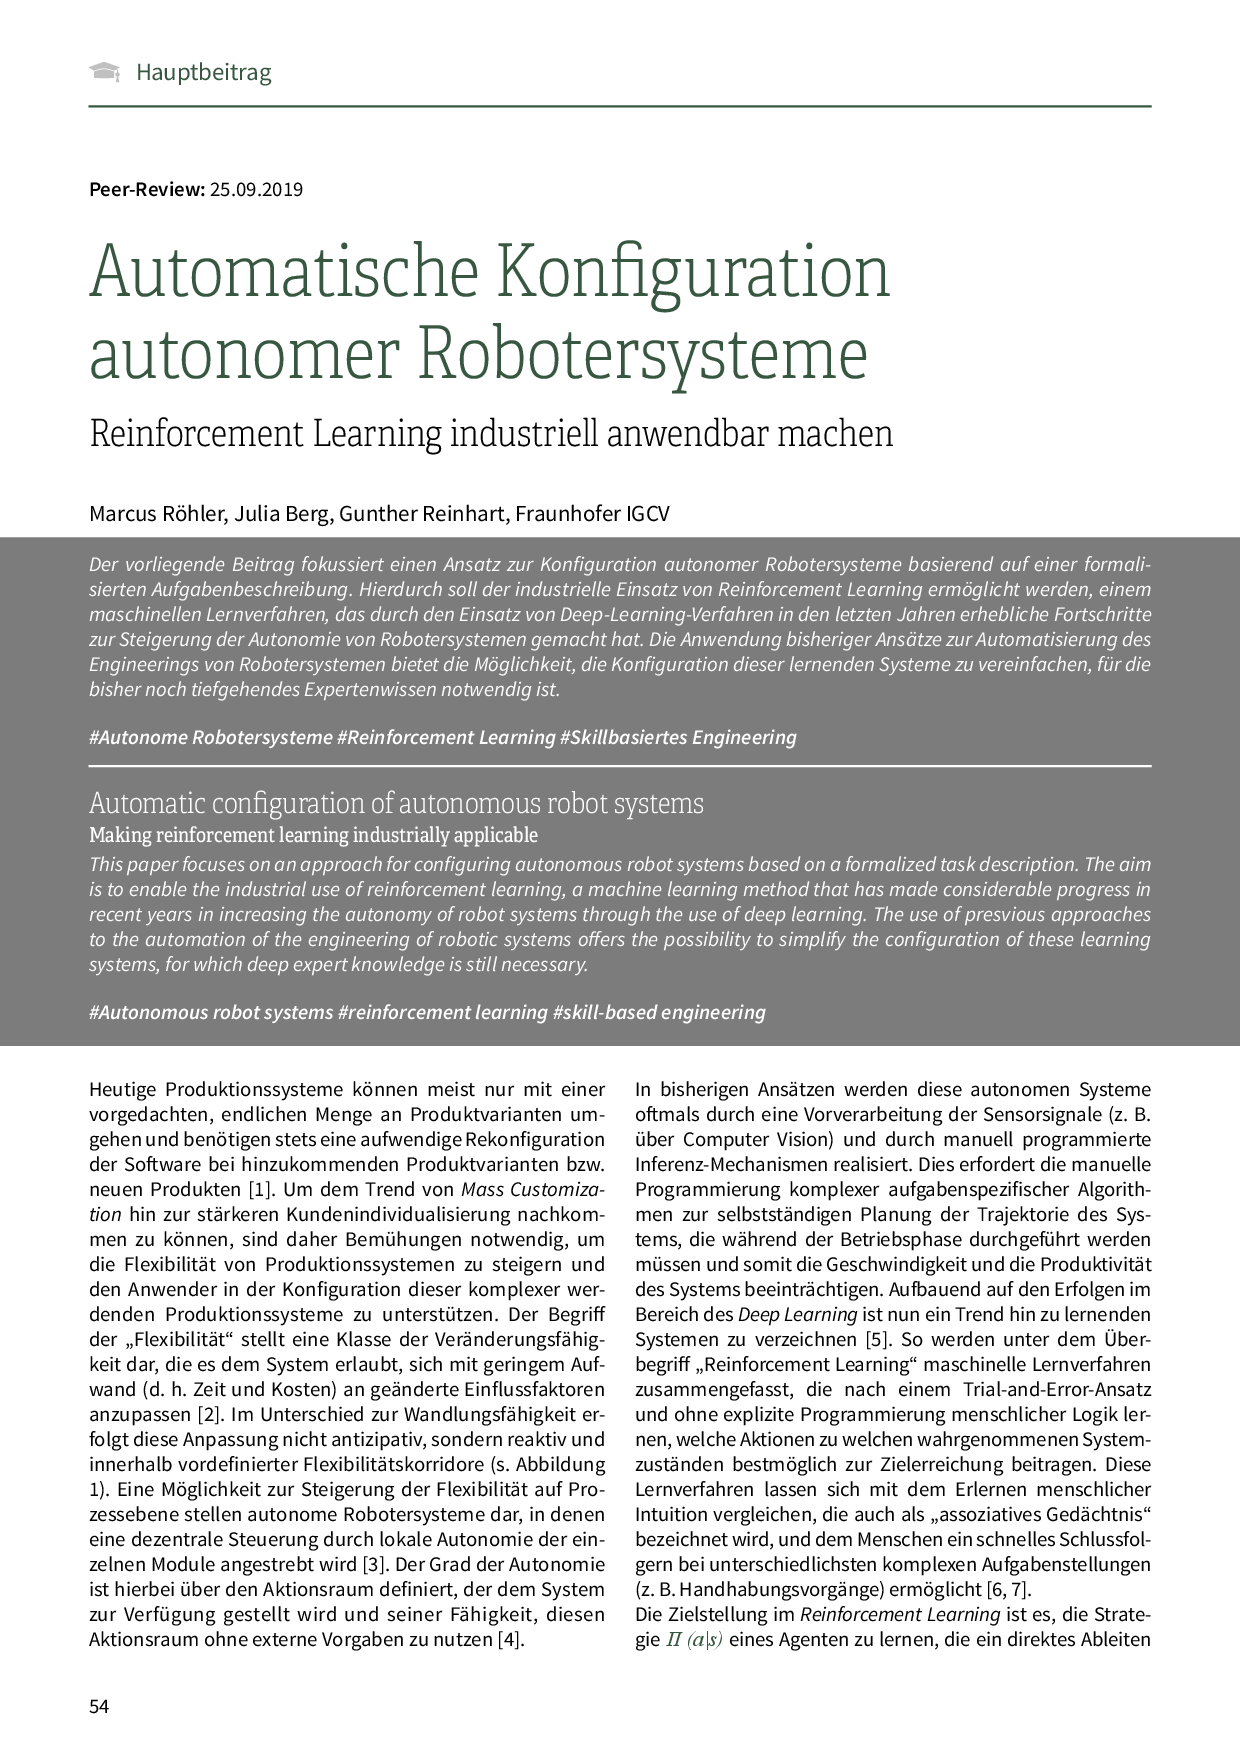 Automatische Konfiguration autonomer Robotersysteme